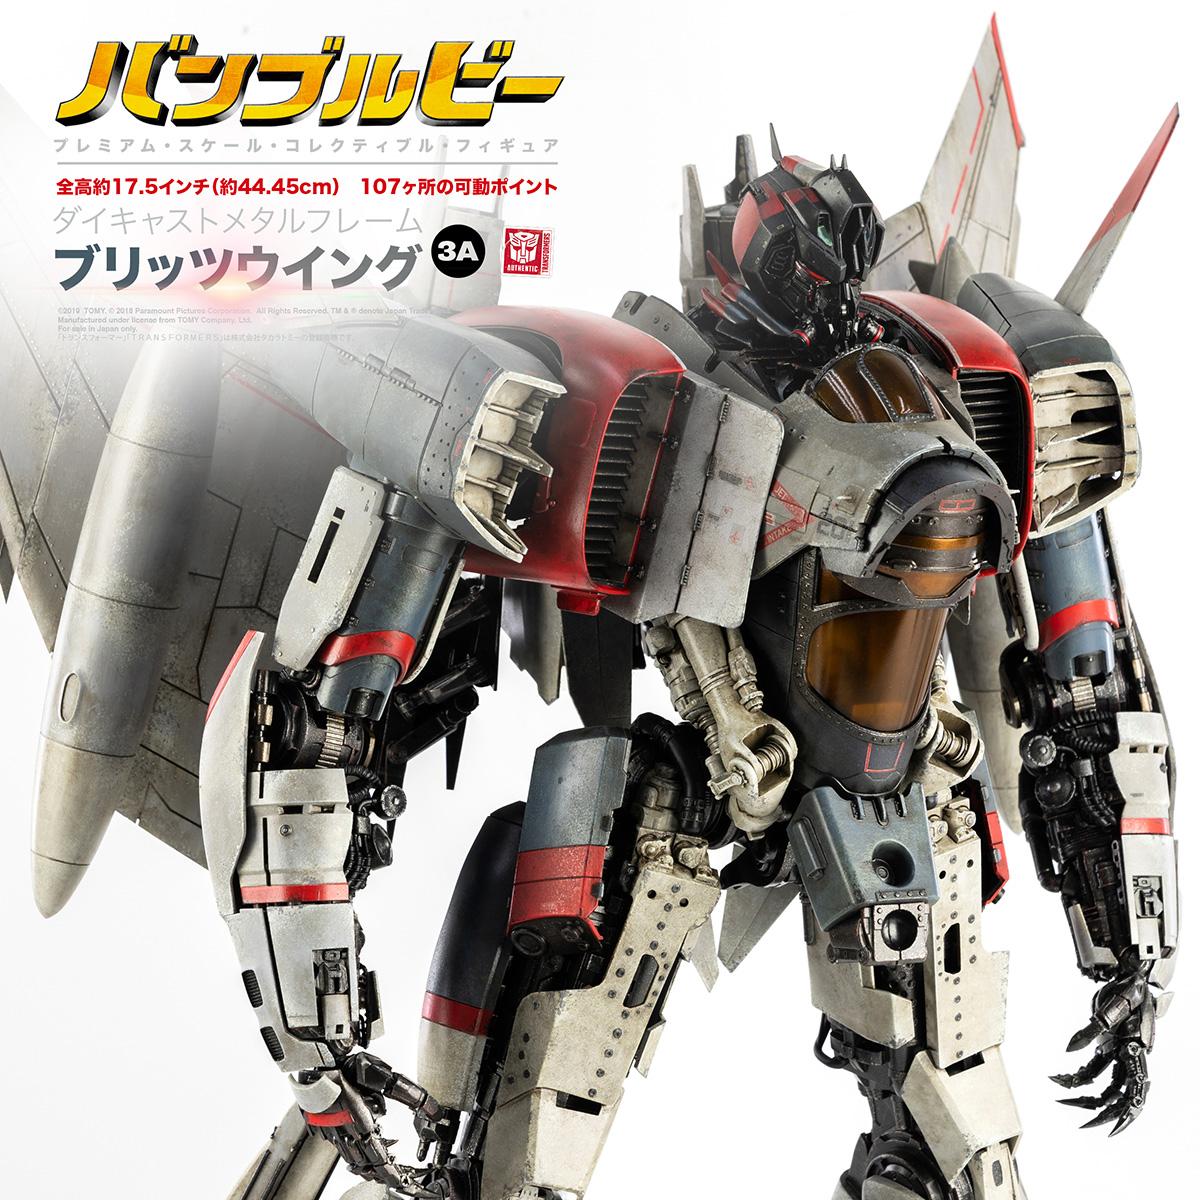 Blitzwing_PM_JAP_0948.jpg